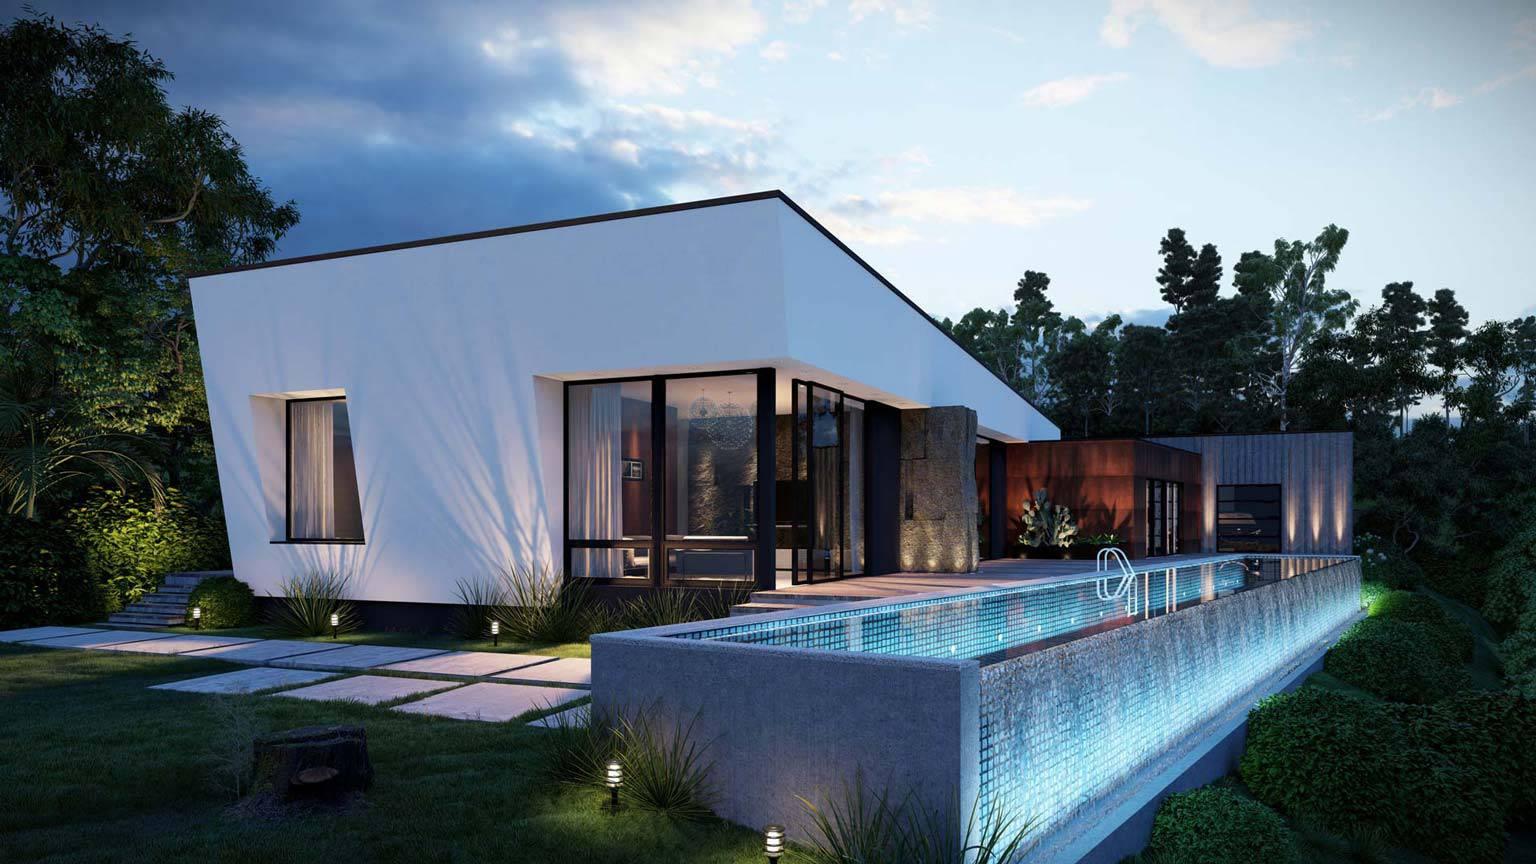 Villa-pool-exterior-1536x864_Lumion10_TenOverStudio